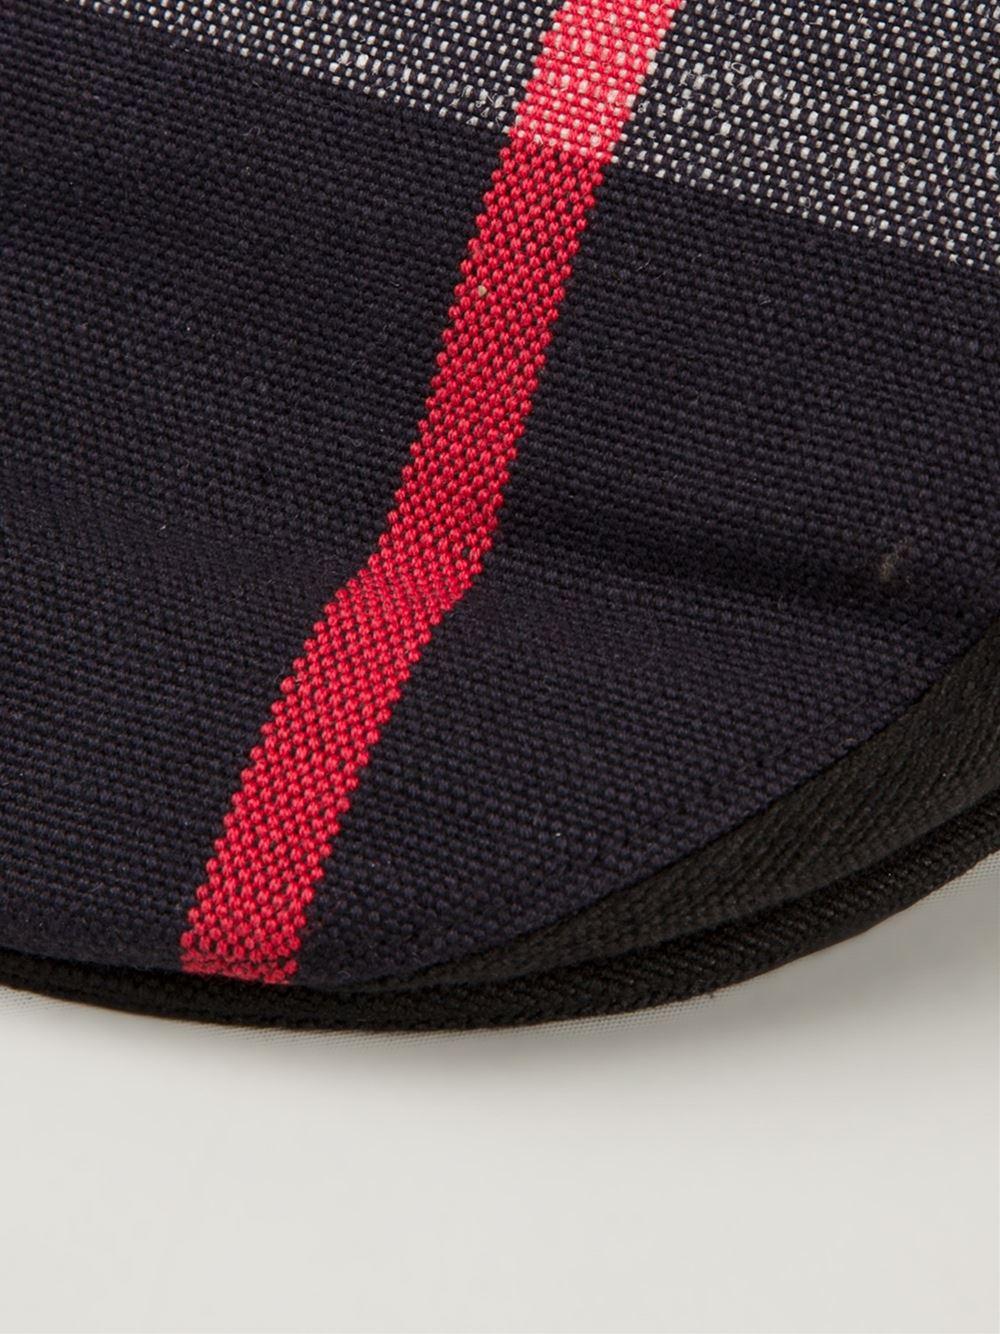 b58d00ef881 Burberry Check Flat Cap in Black for Men